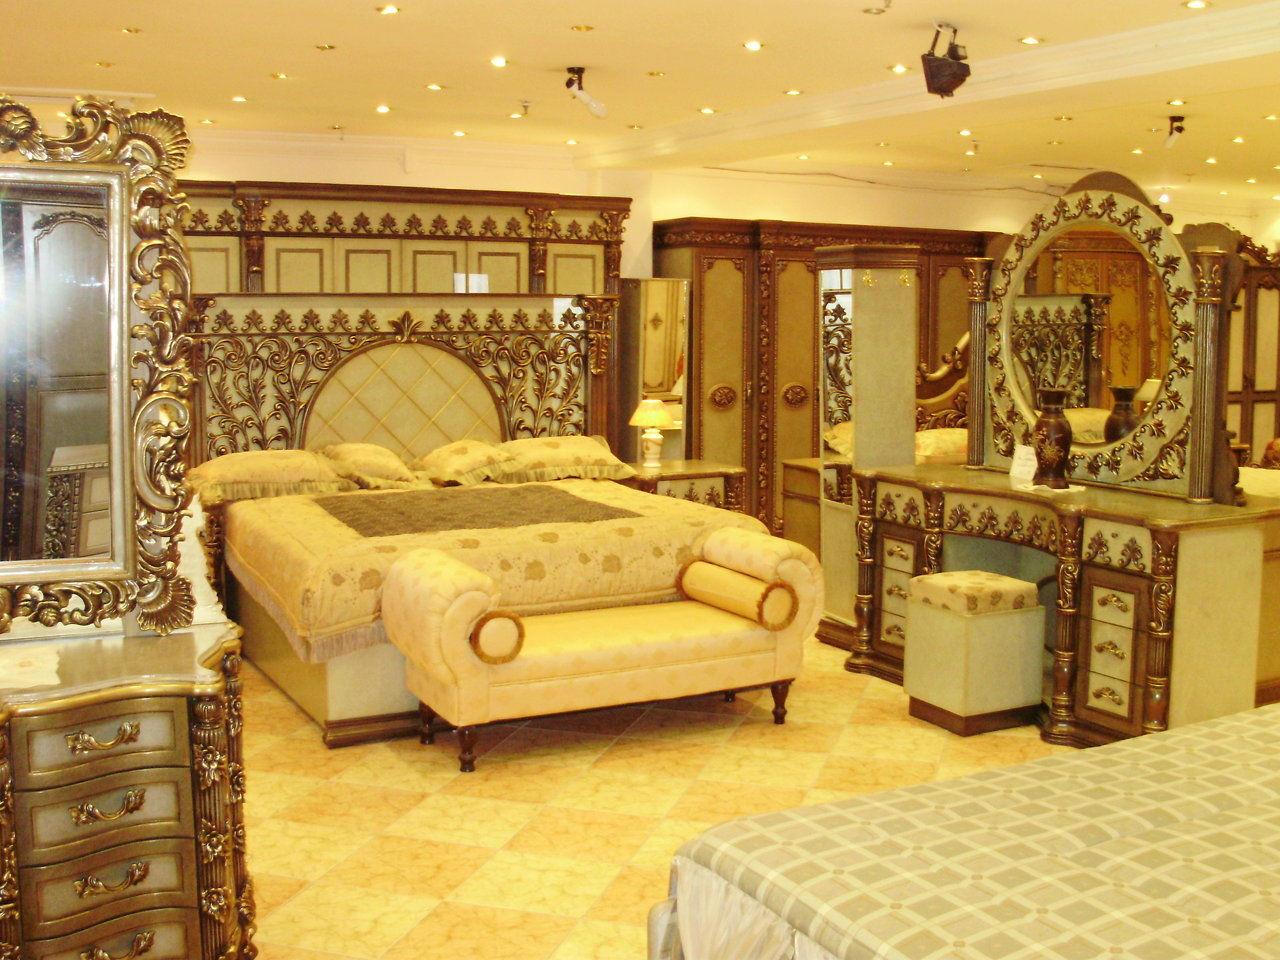 elegance furniture created by bangunjoyobedroomset based on